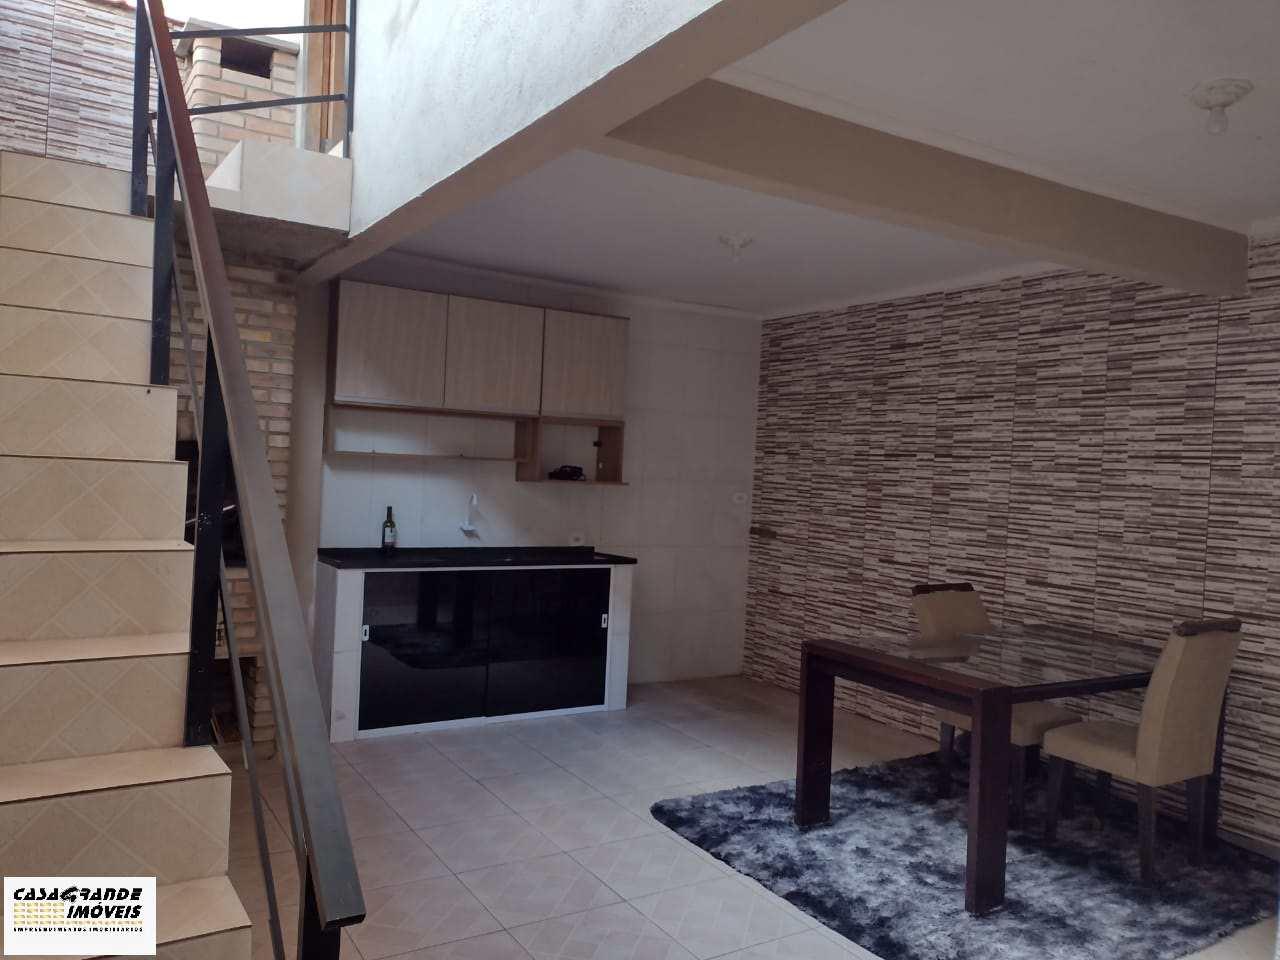 Casa com 2 dorms, Mirim, Praia Grande - R$ 310 mil, Cod: 6361